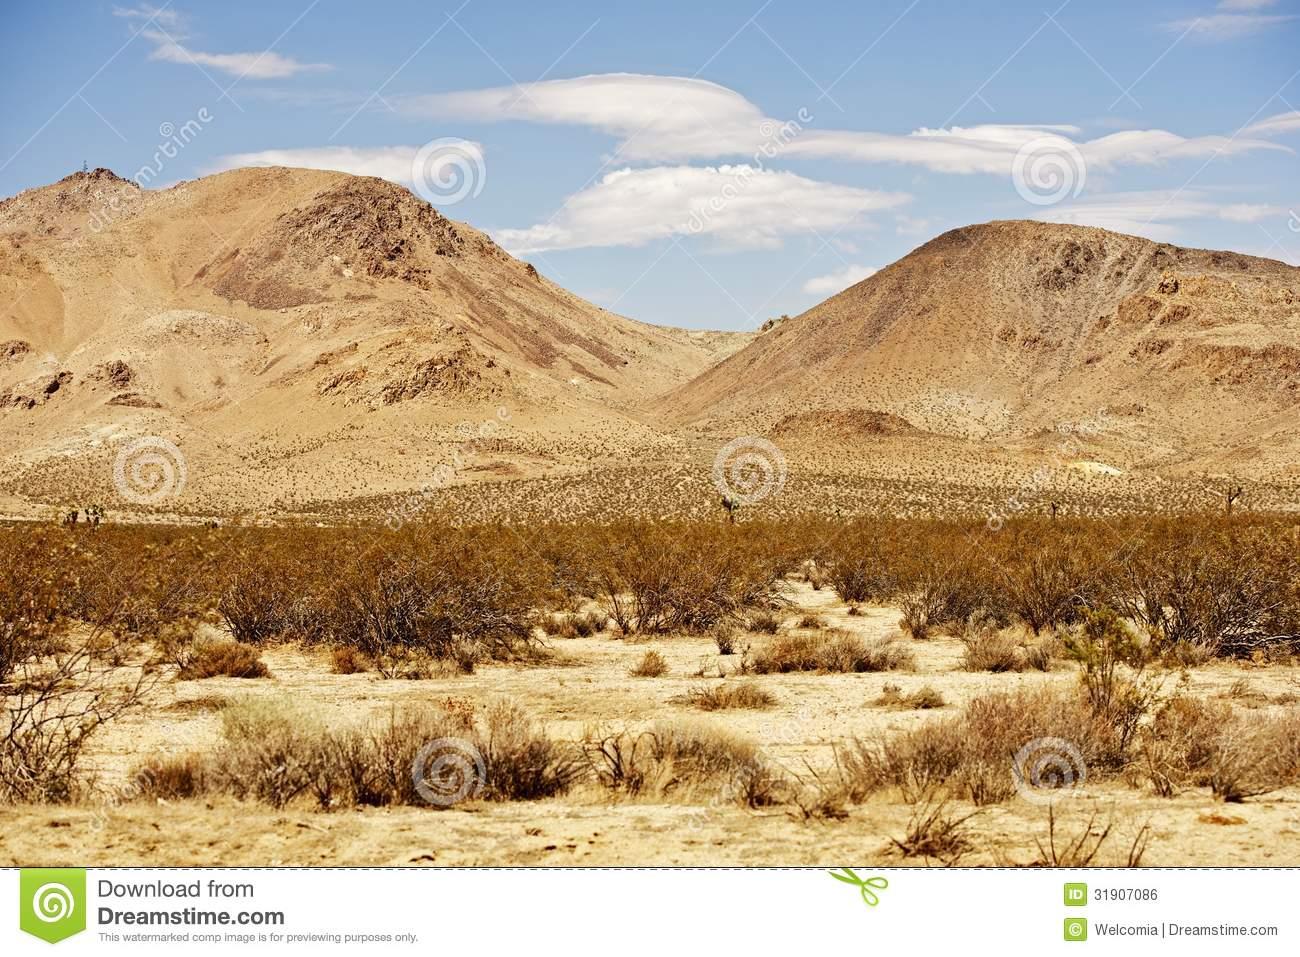 Mojave Desert clipart #19, Download drawings